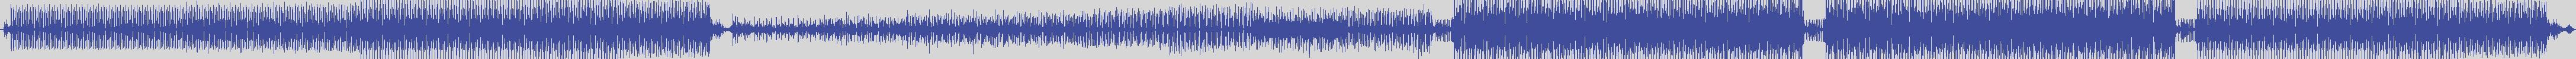 just_digital_records [JS1361] Kosmica - Volcano [Original Mix] audio wave form